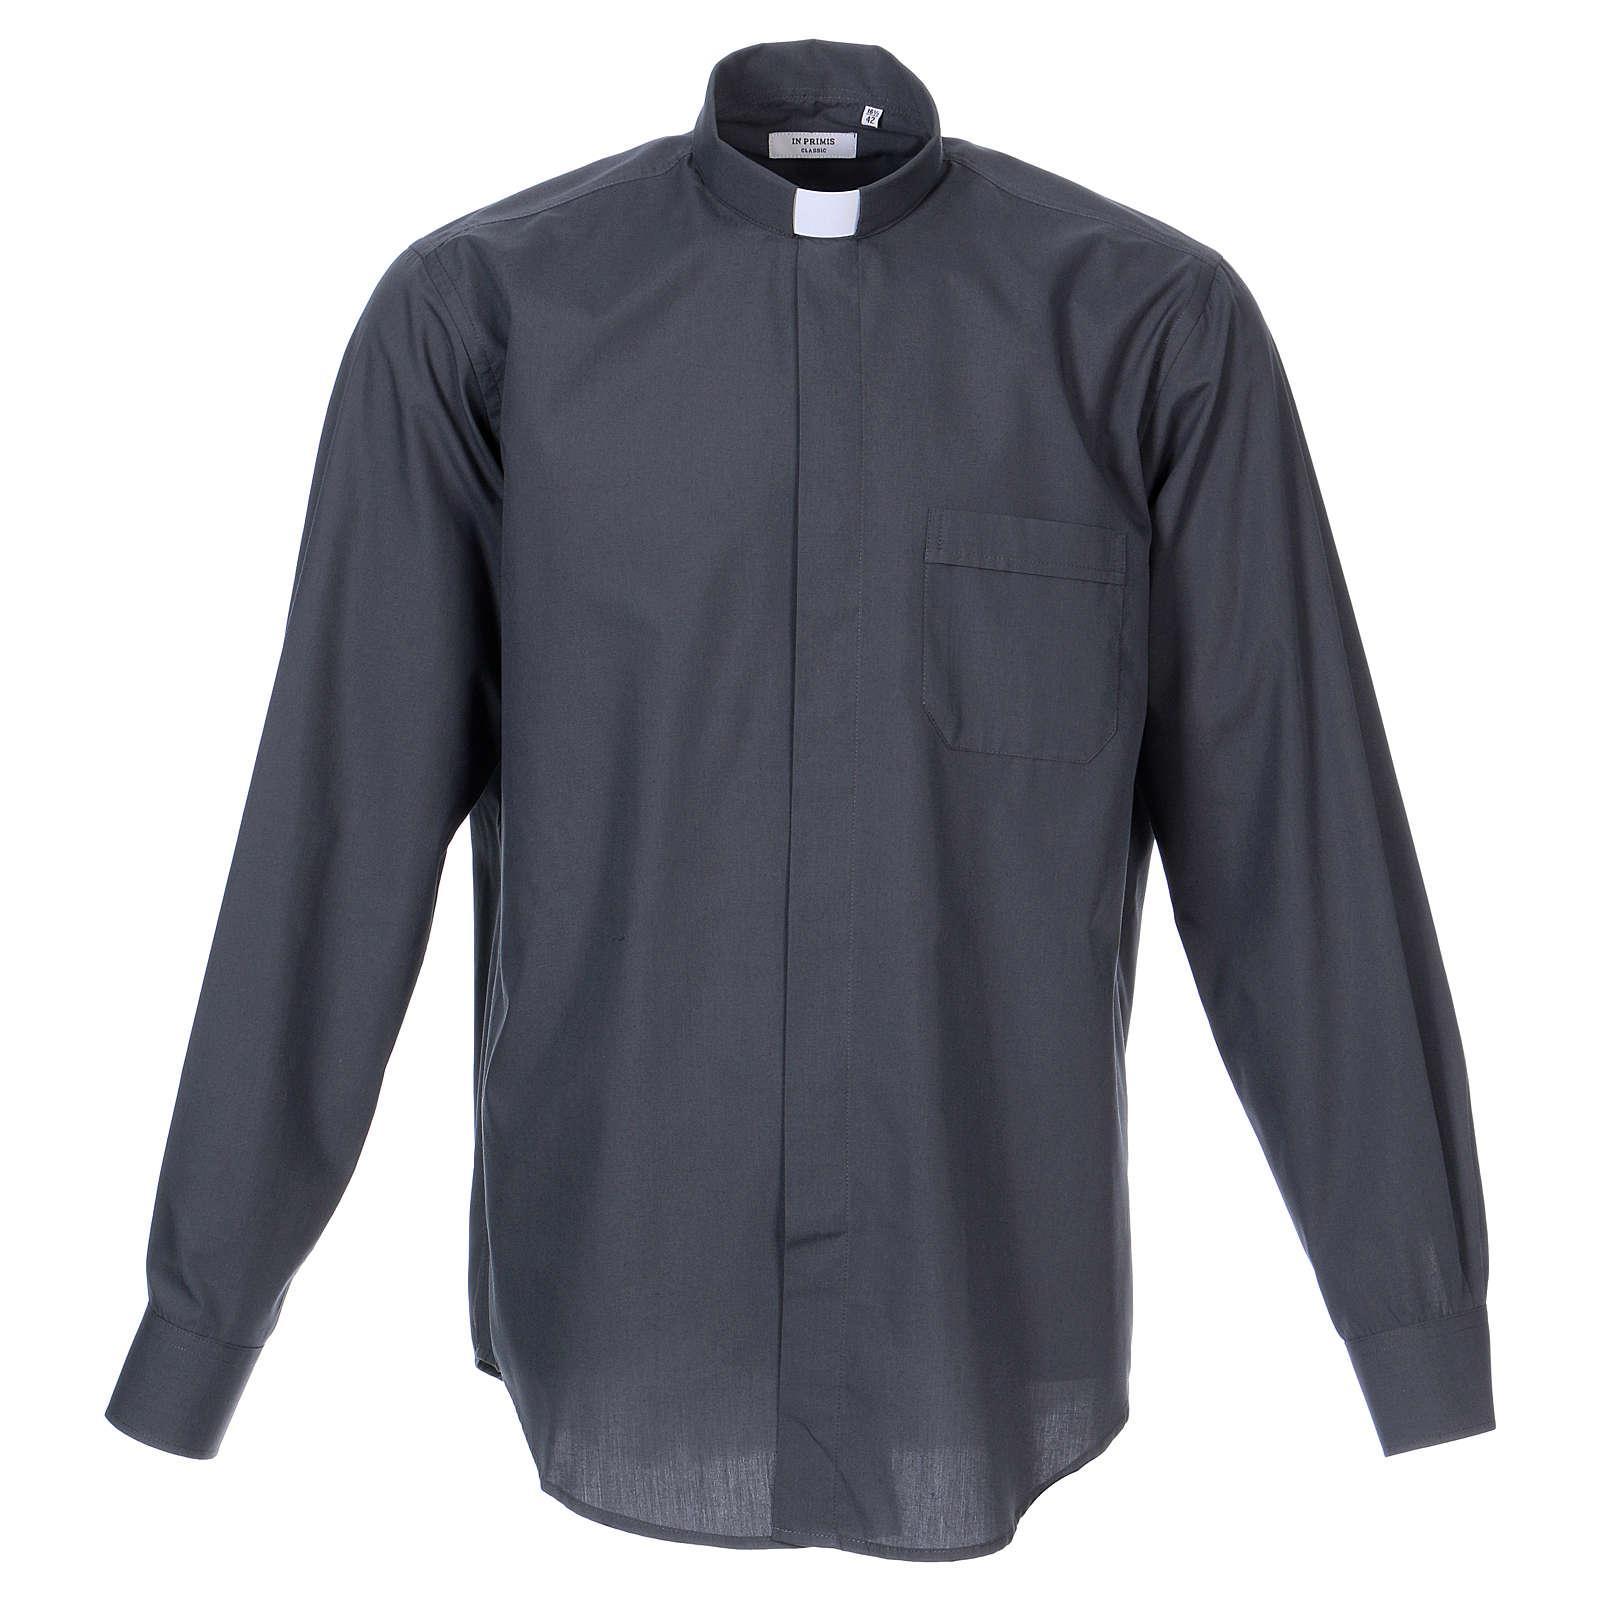 Camisa Clergy mixto algodón manga larga gris oscuro In Primis 4